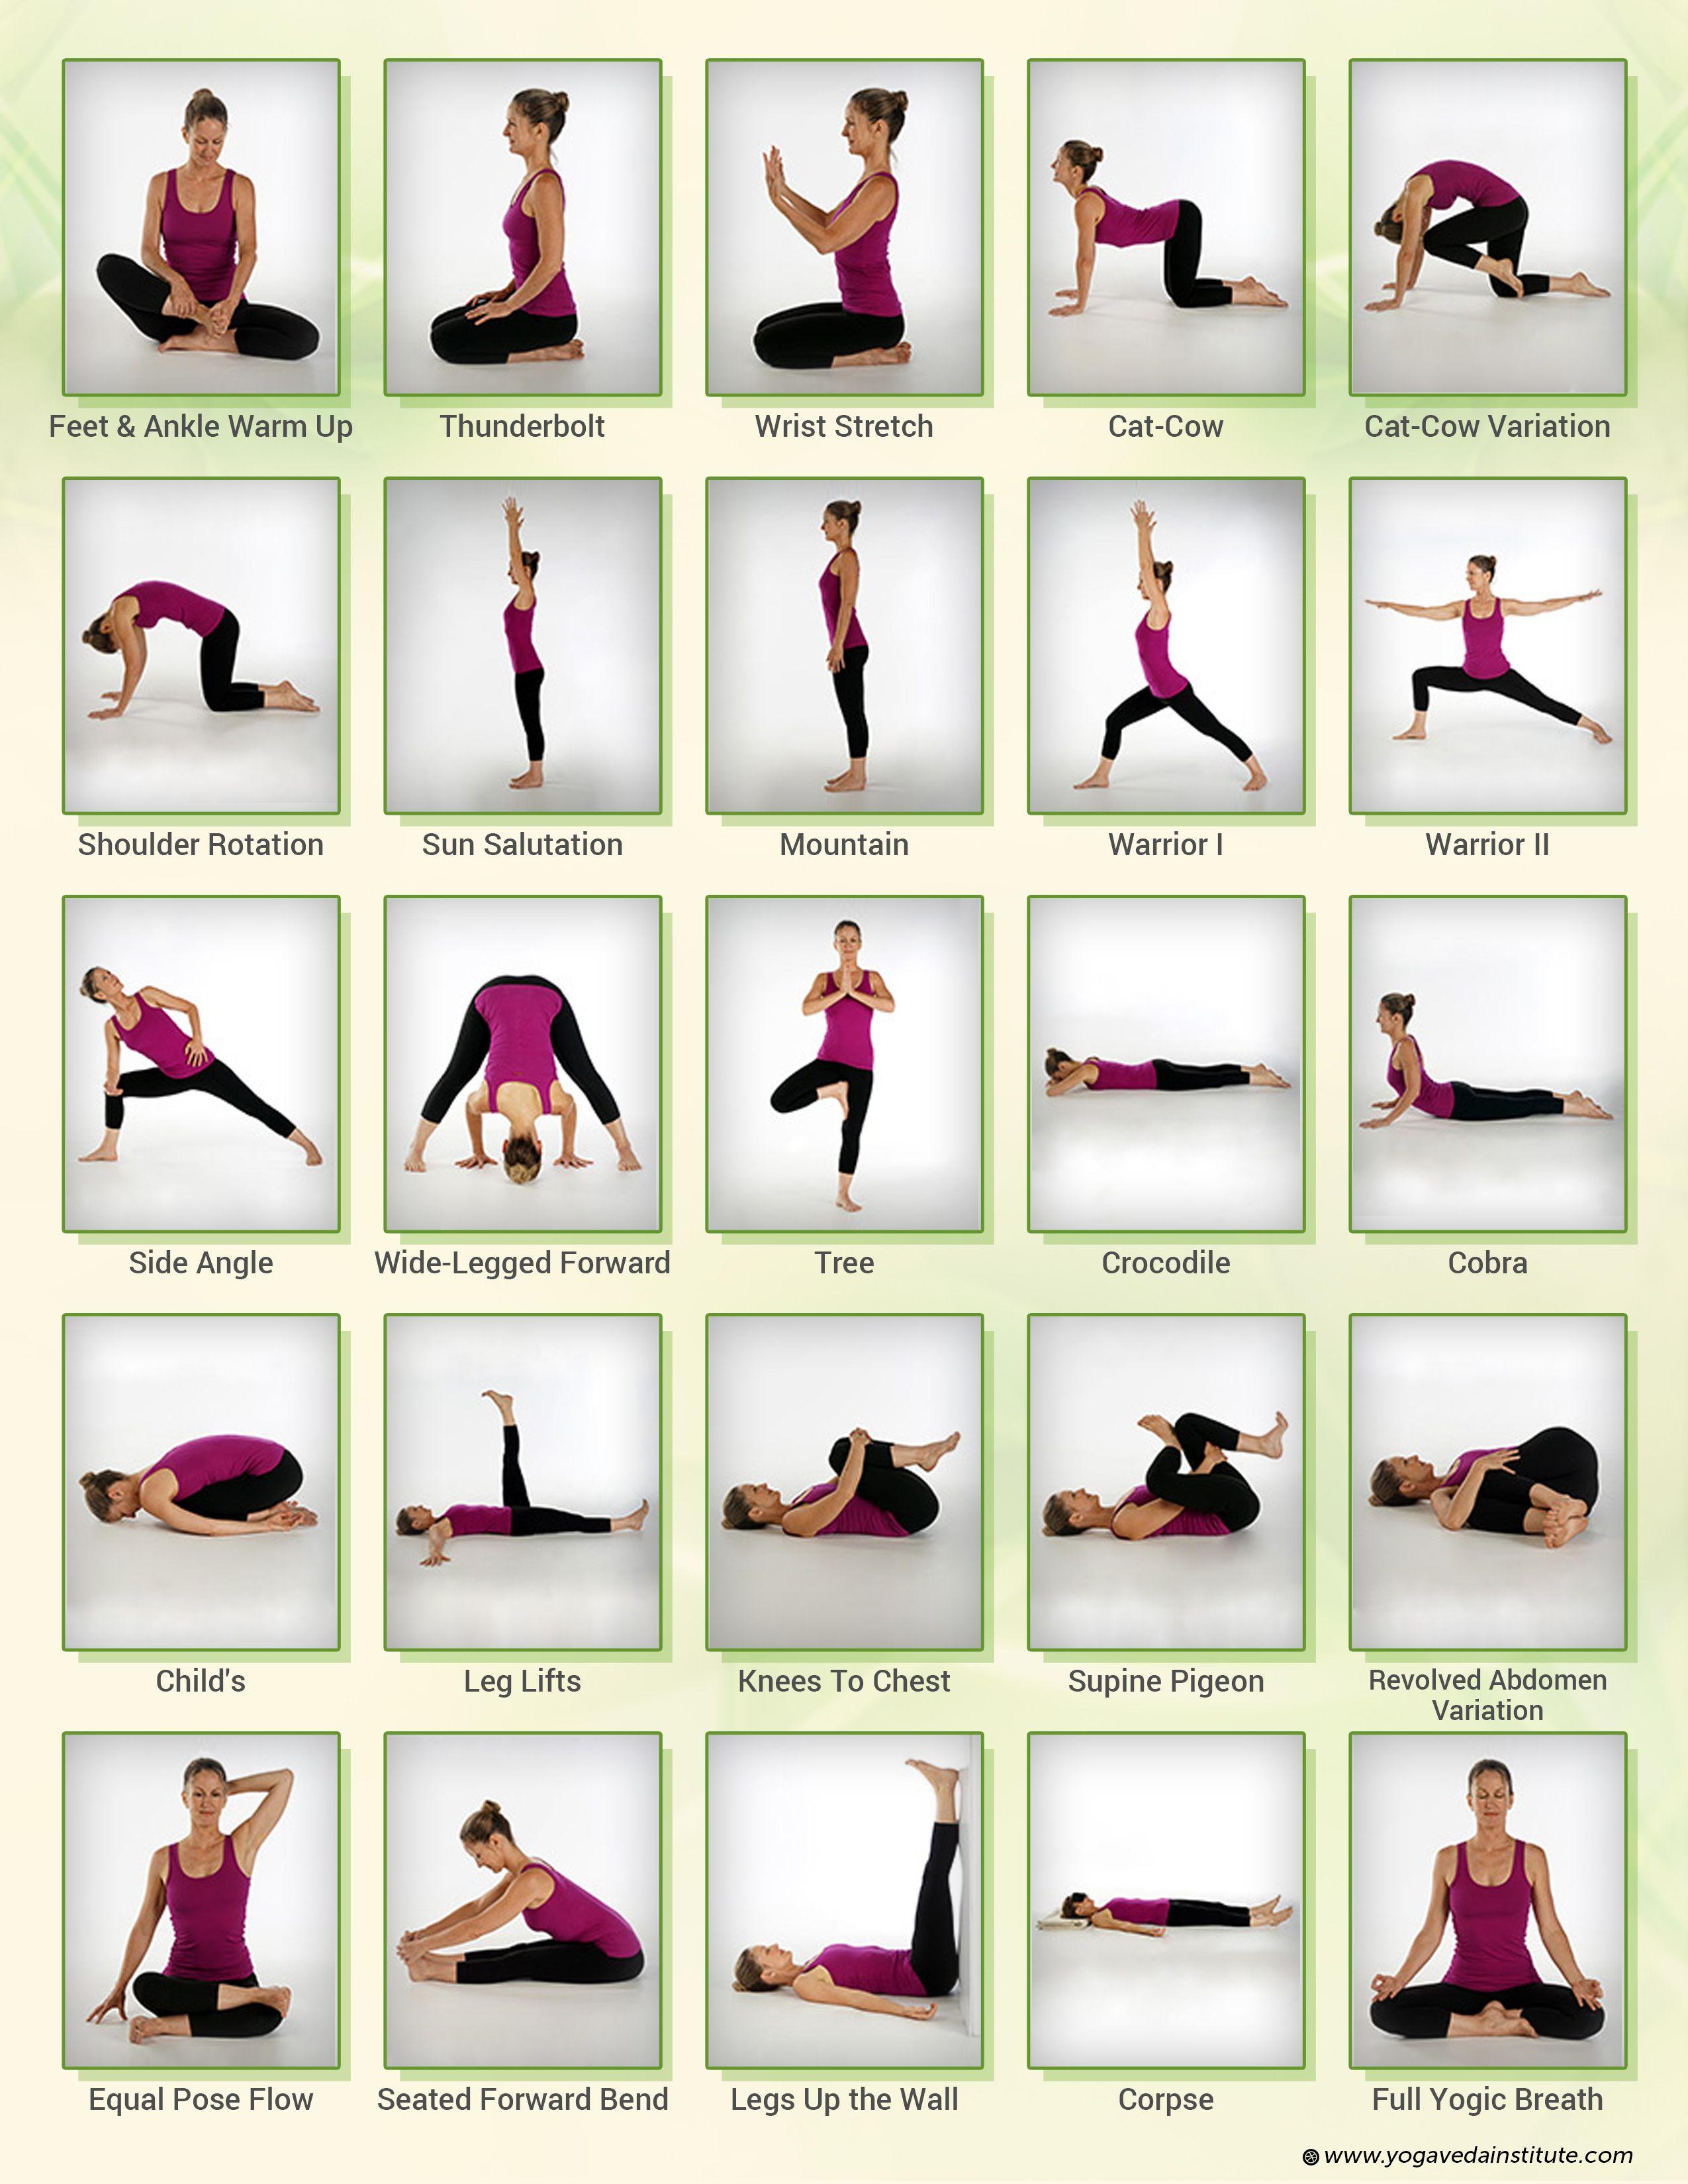 VATA Pacifying Yoga